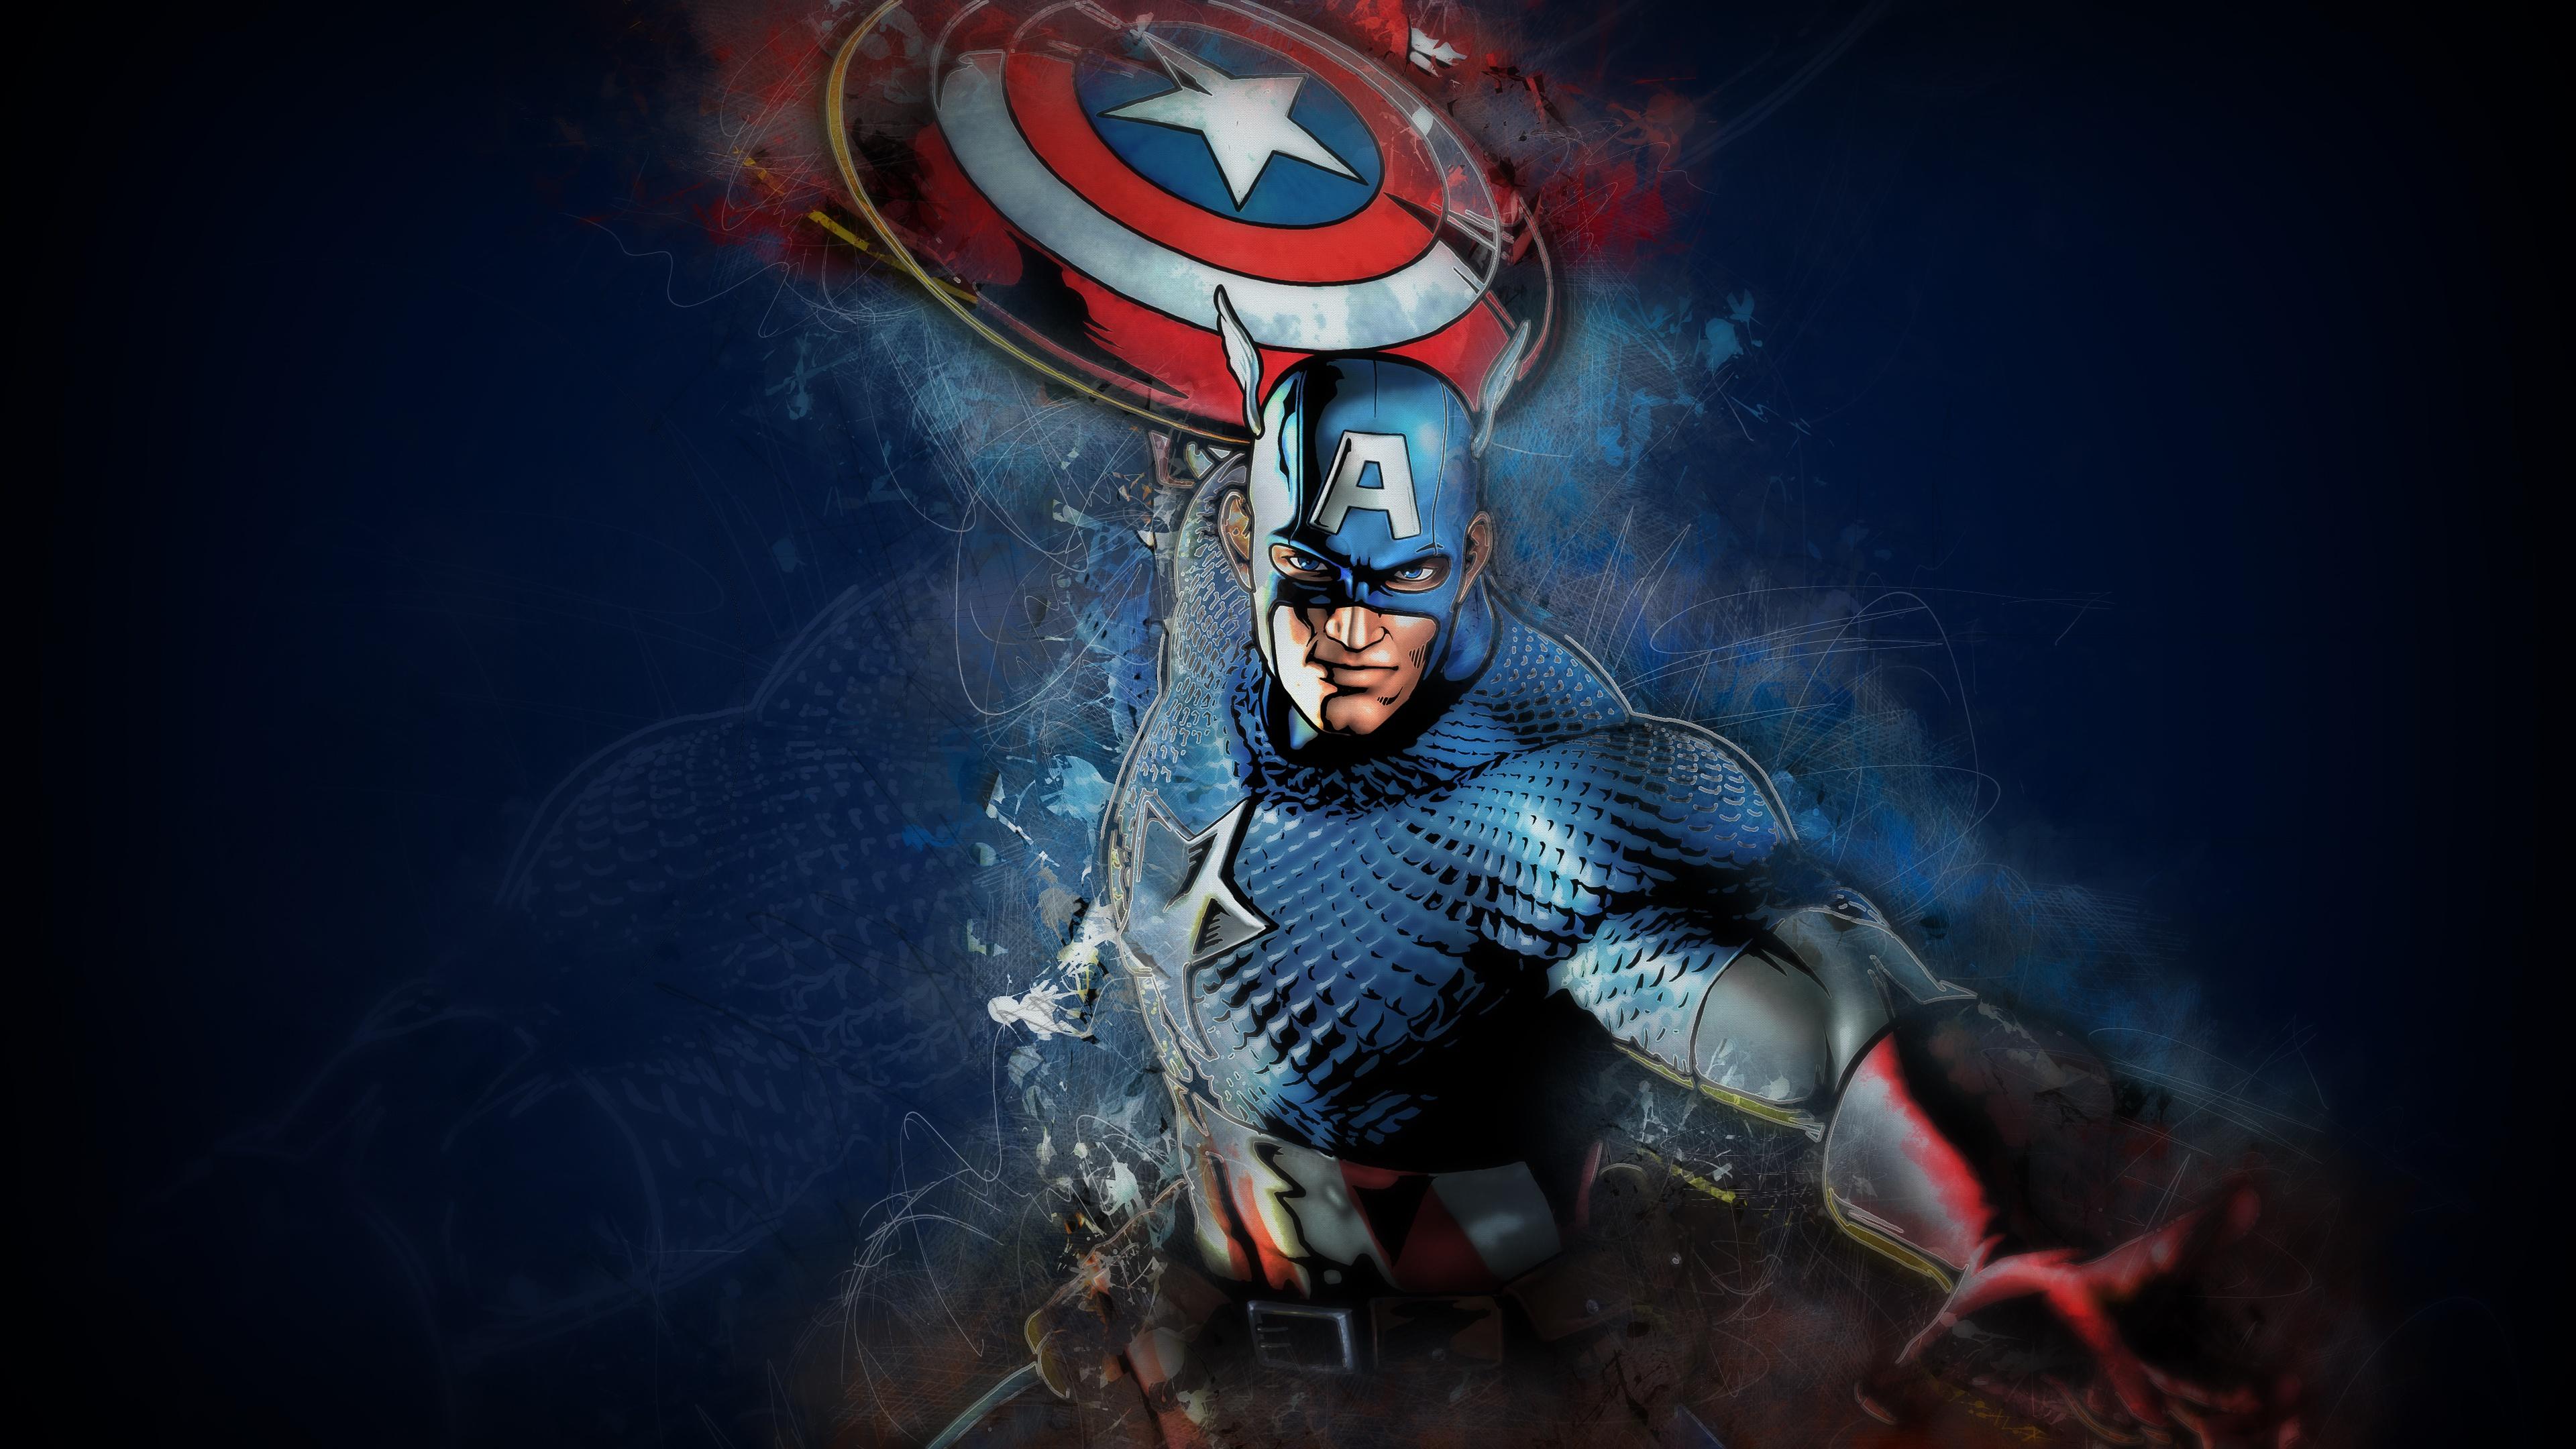 Captain America 4k Ultra Hd Wallpaper Background Image